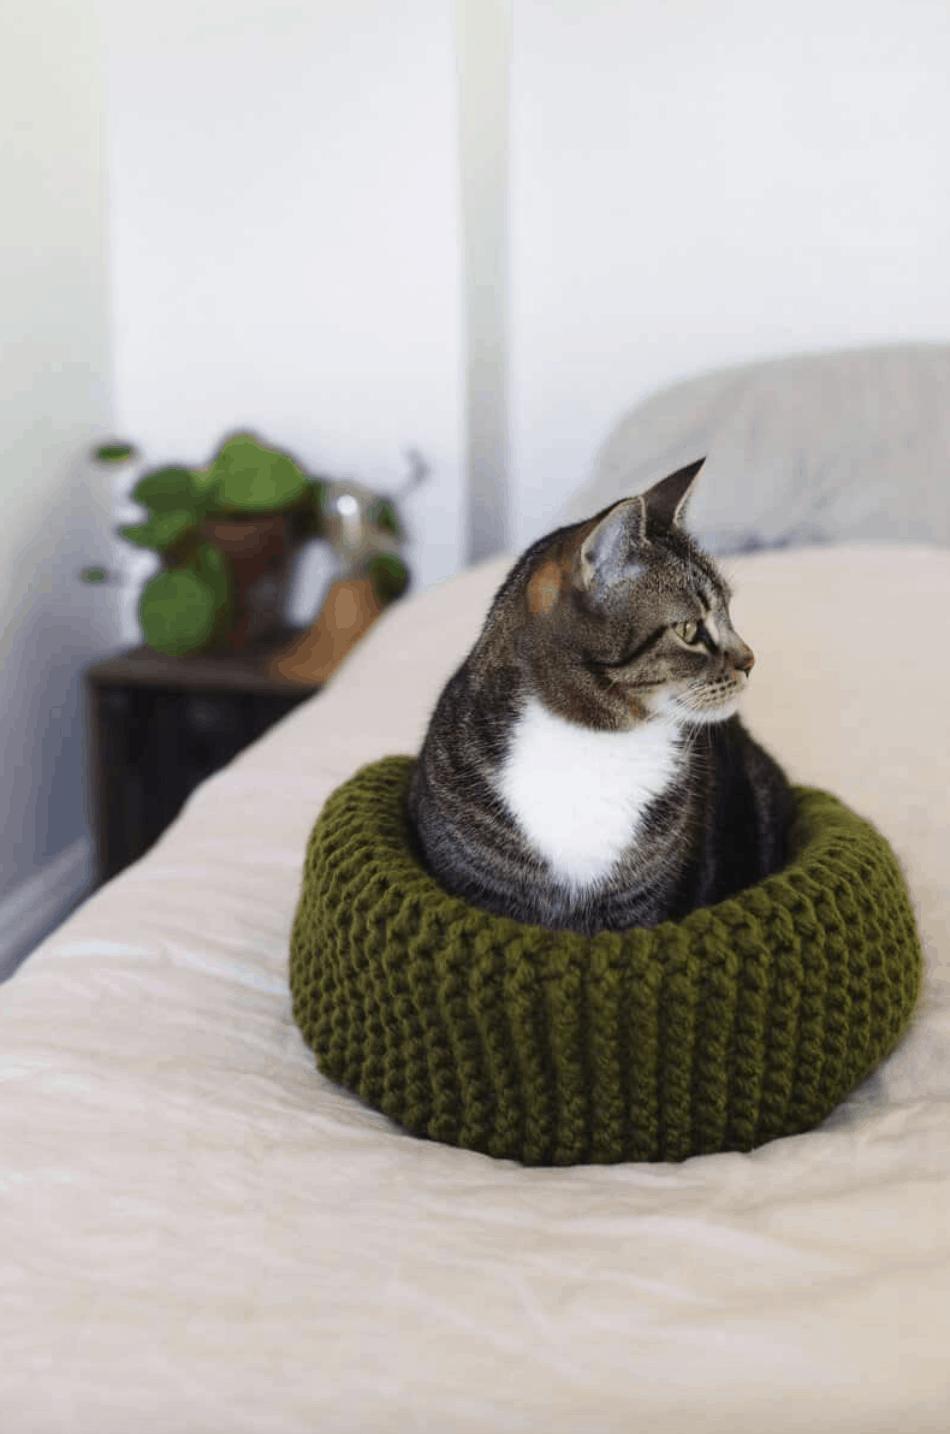 Crochet Pet Cat Bed Free Pattern | Crochet cat bed, Diy crochet ... | 1434x950